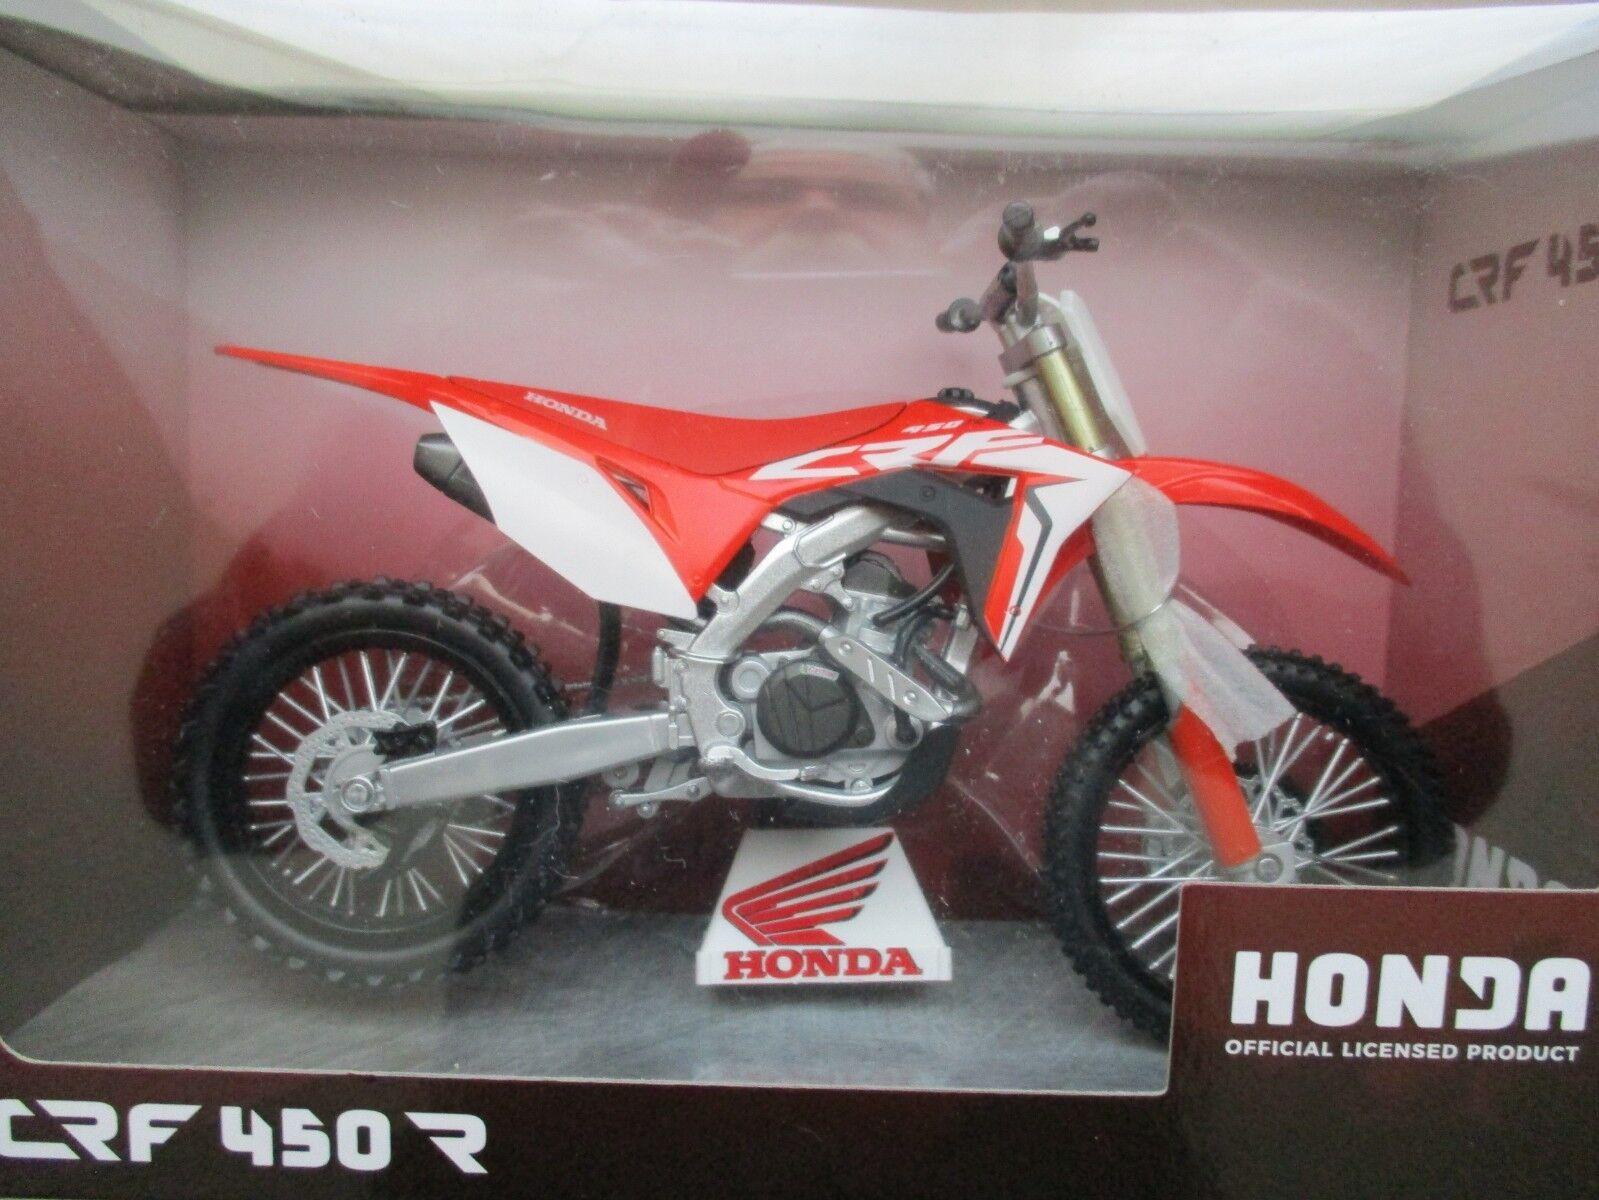 MOTO MINIATURE HONDA CRF 450 R R R 2019 EN BOITE REPRO CONSTRUCTEUR a17d04